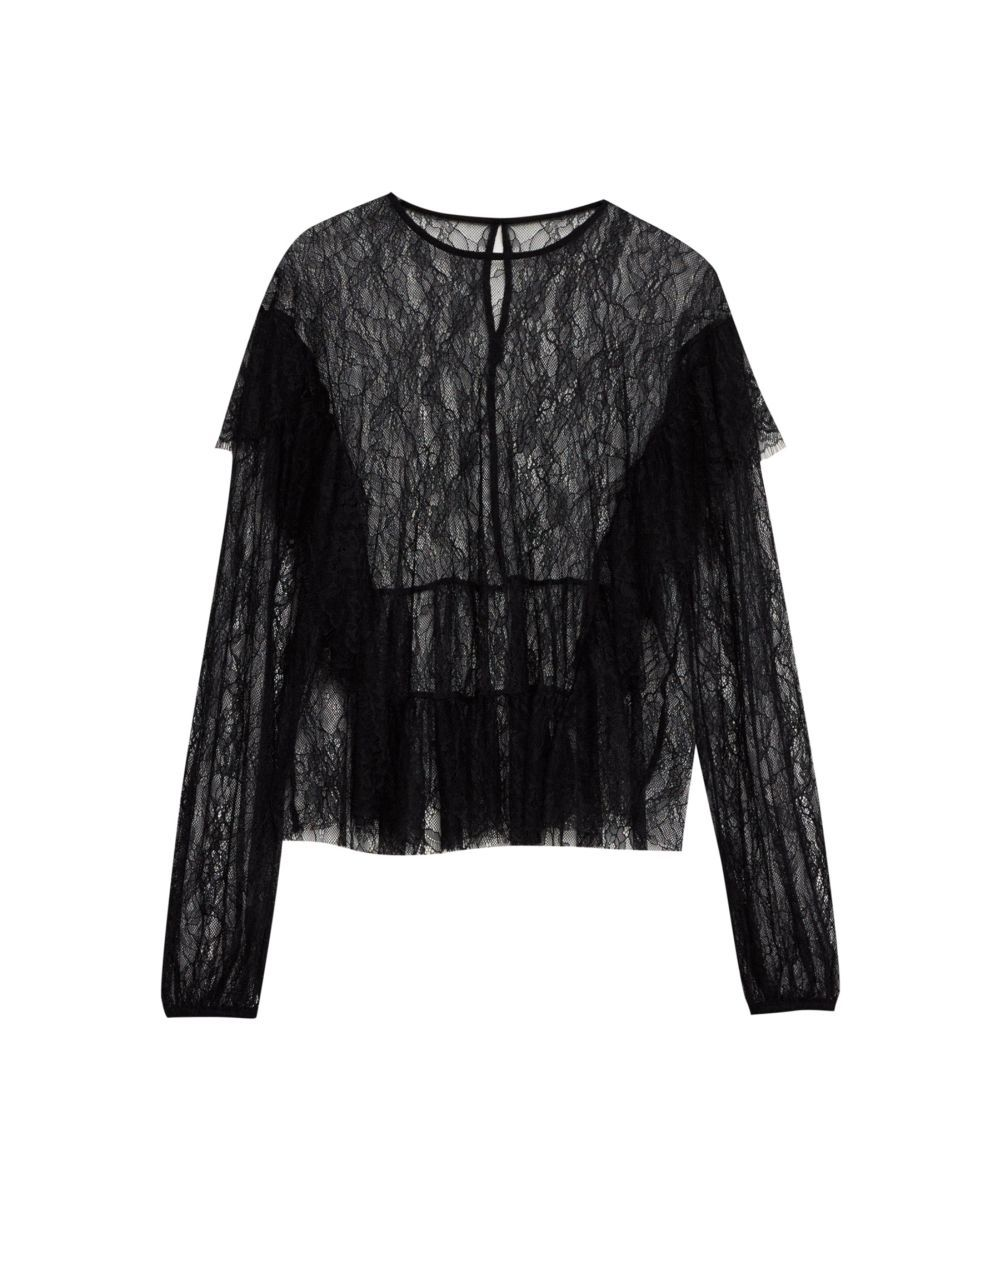 Camisa de encaje negro de Pull&Bear (22,99 euros)